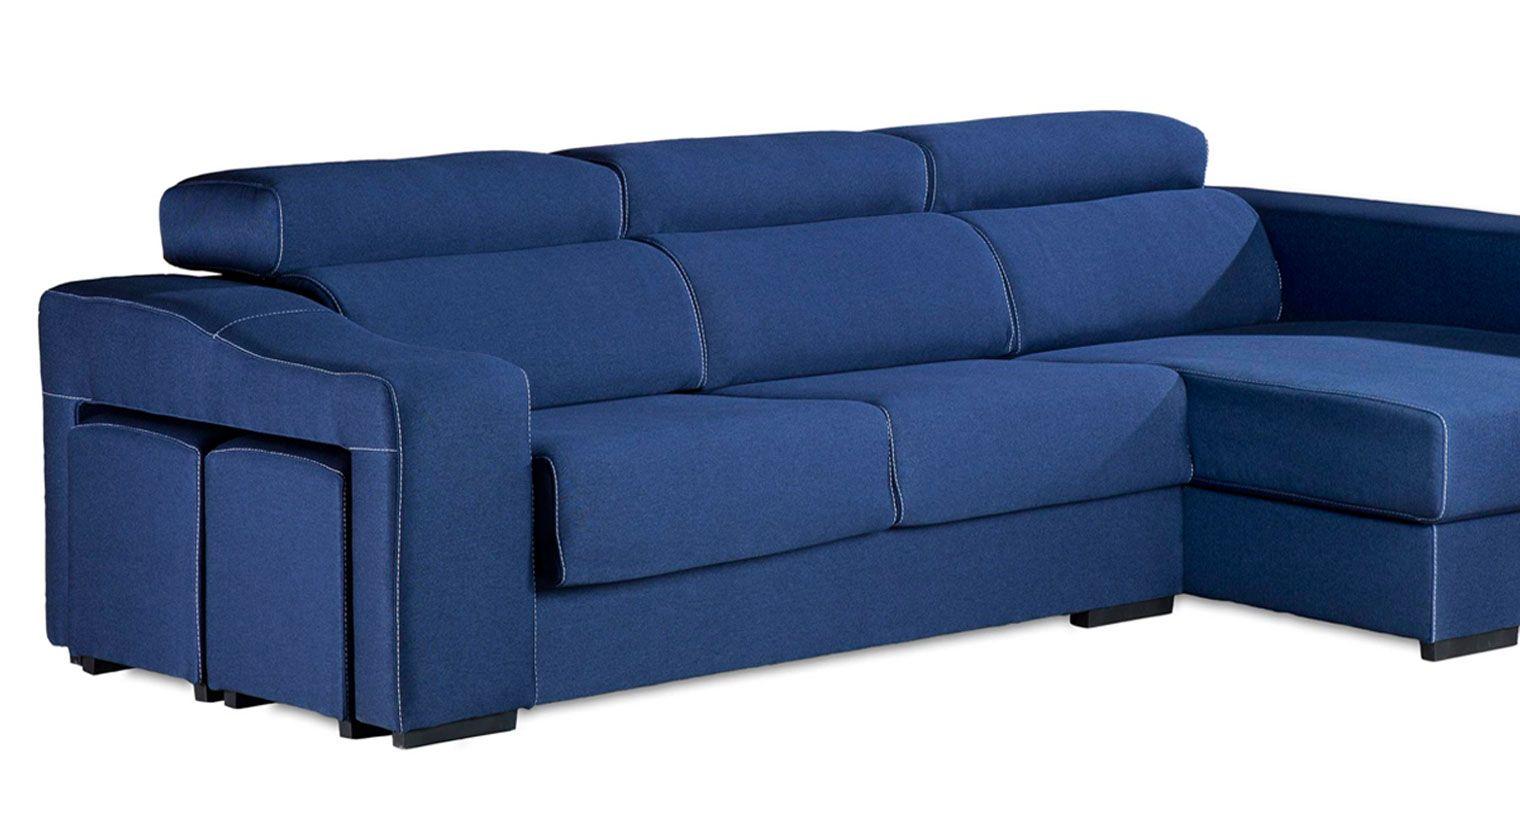 Comprar chaise longue bilbo sof 3 plazas ecolipiel chekko for Sofas baratos murcia